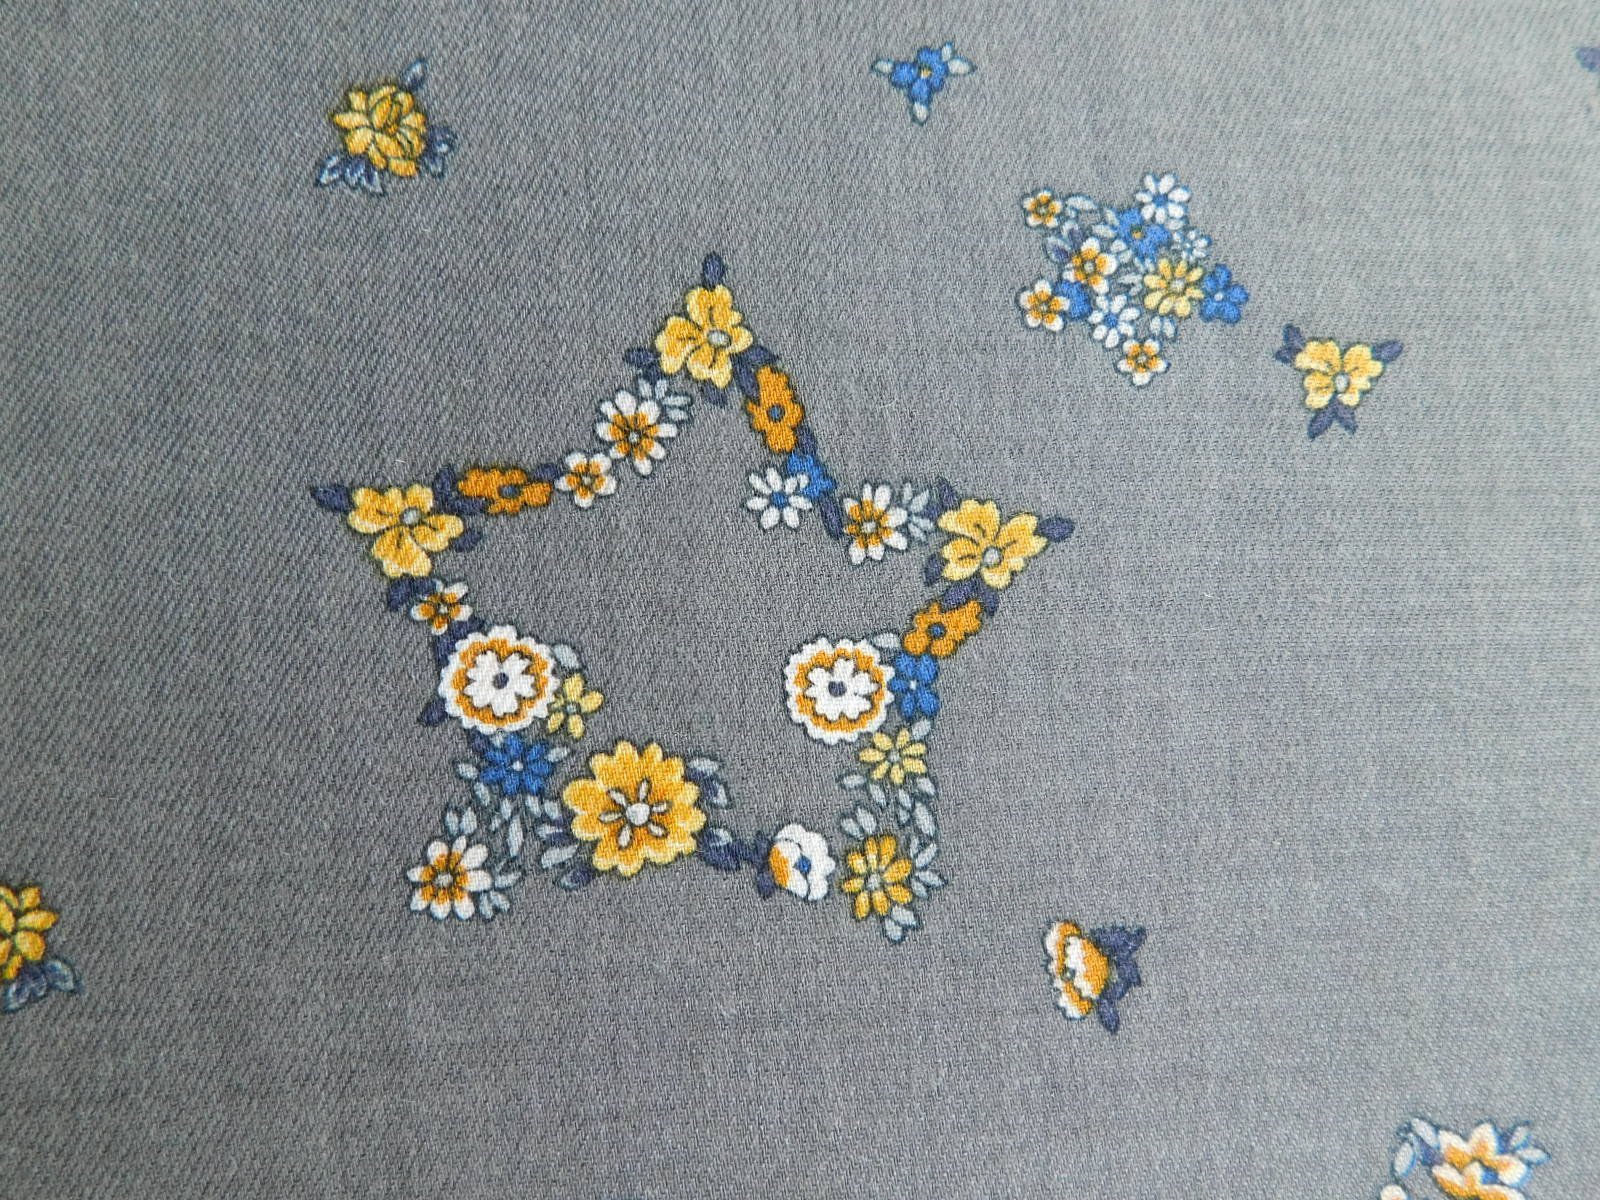 Blue Floral Star Print Wool Challis